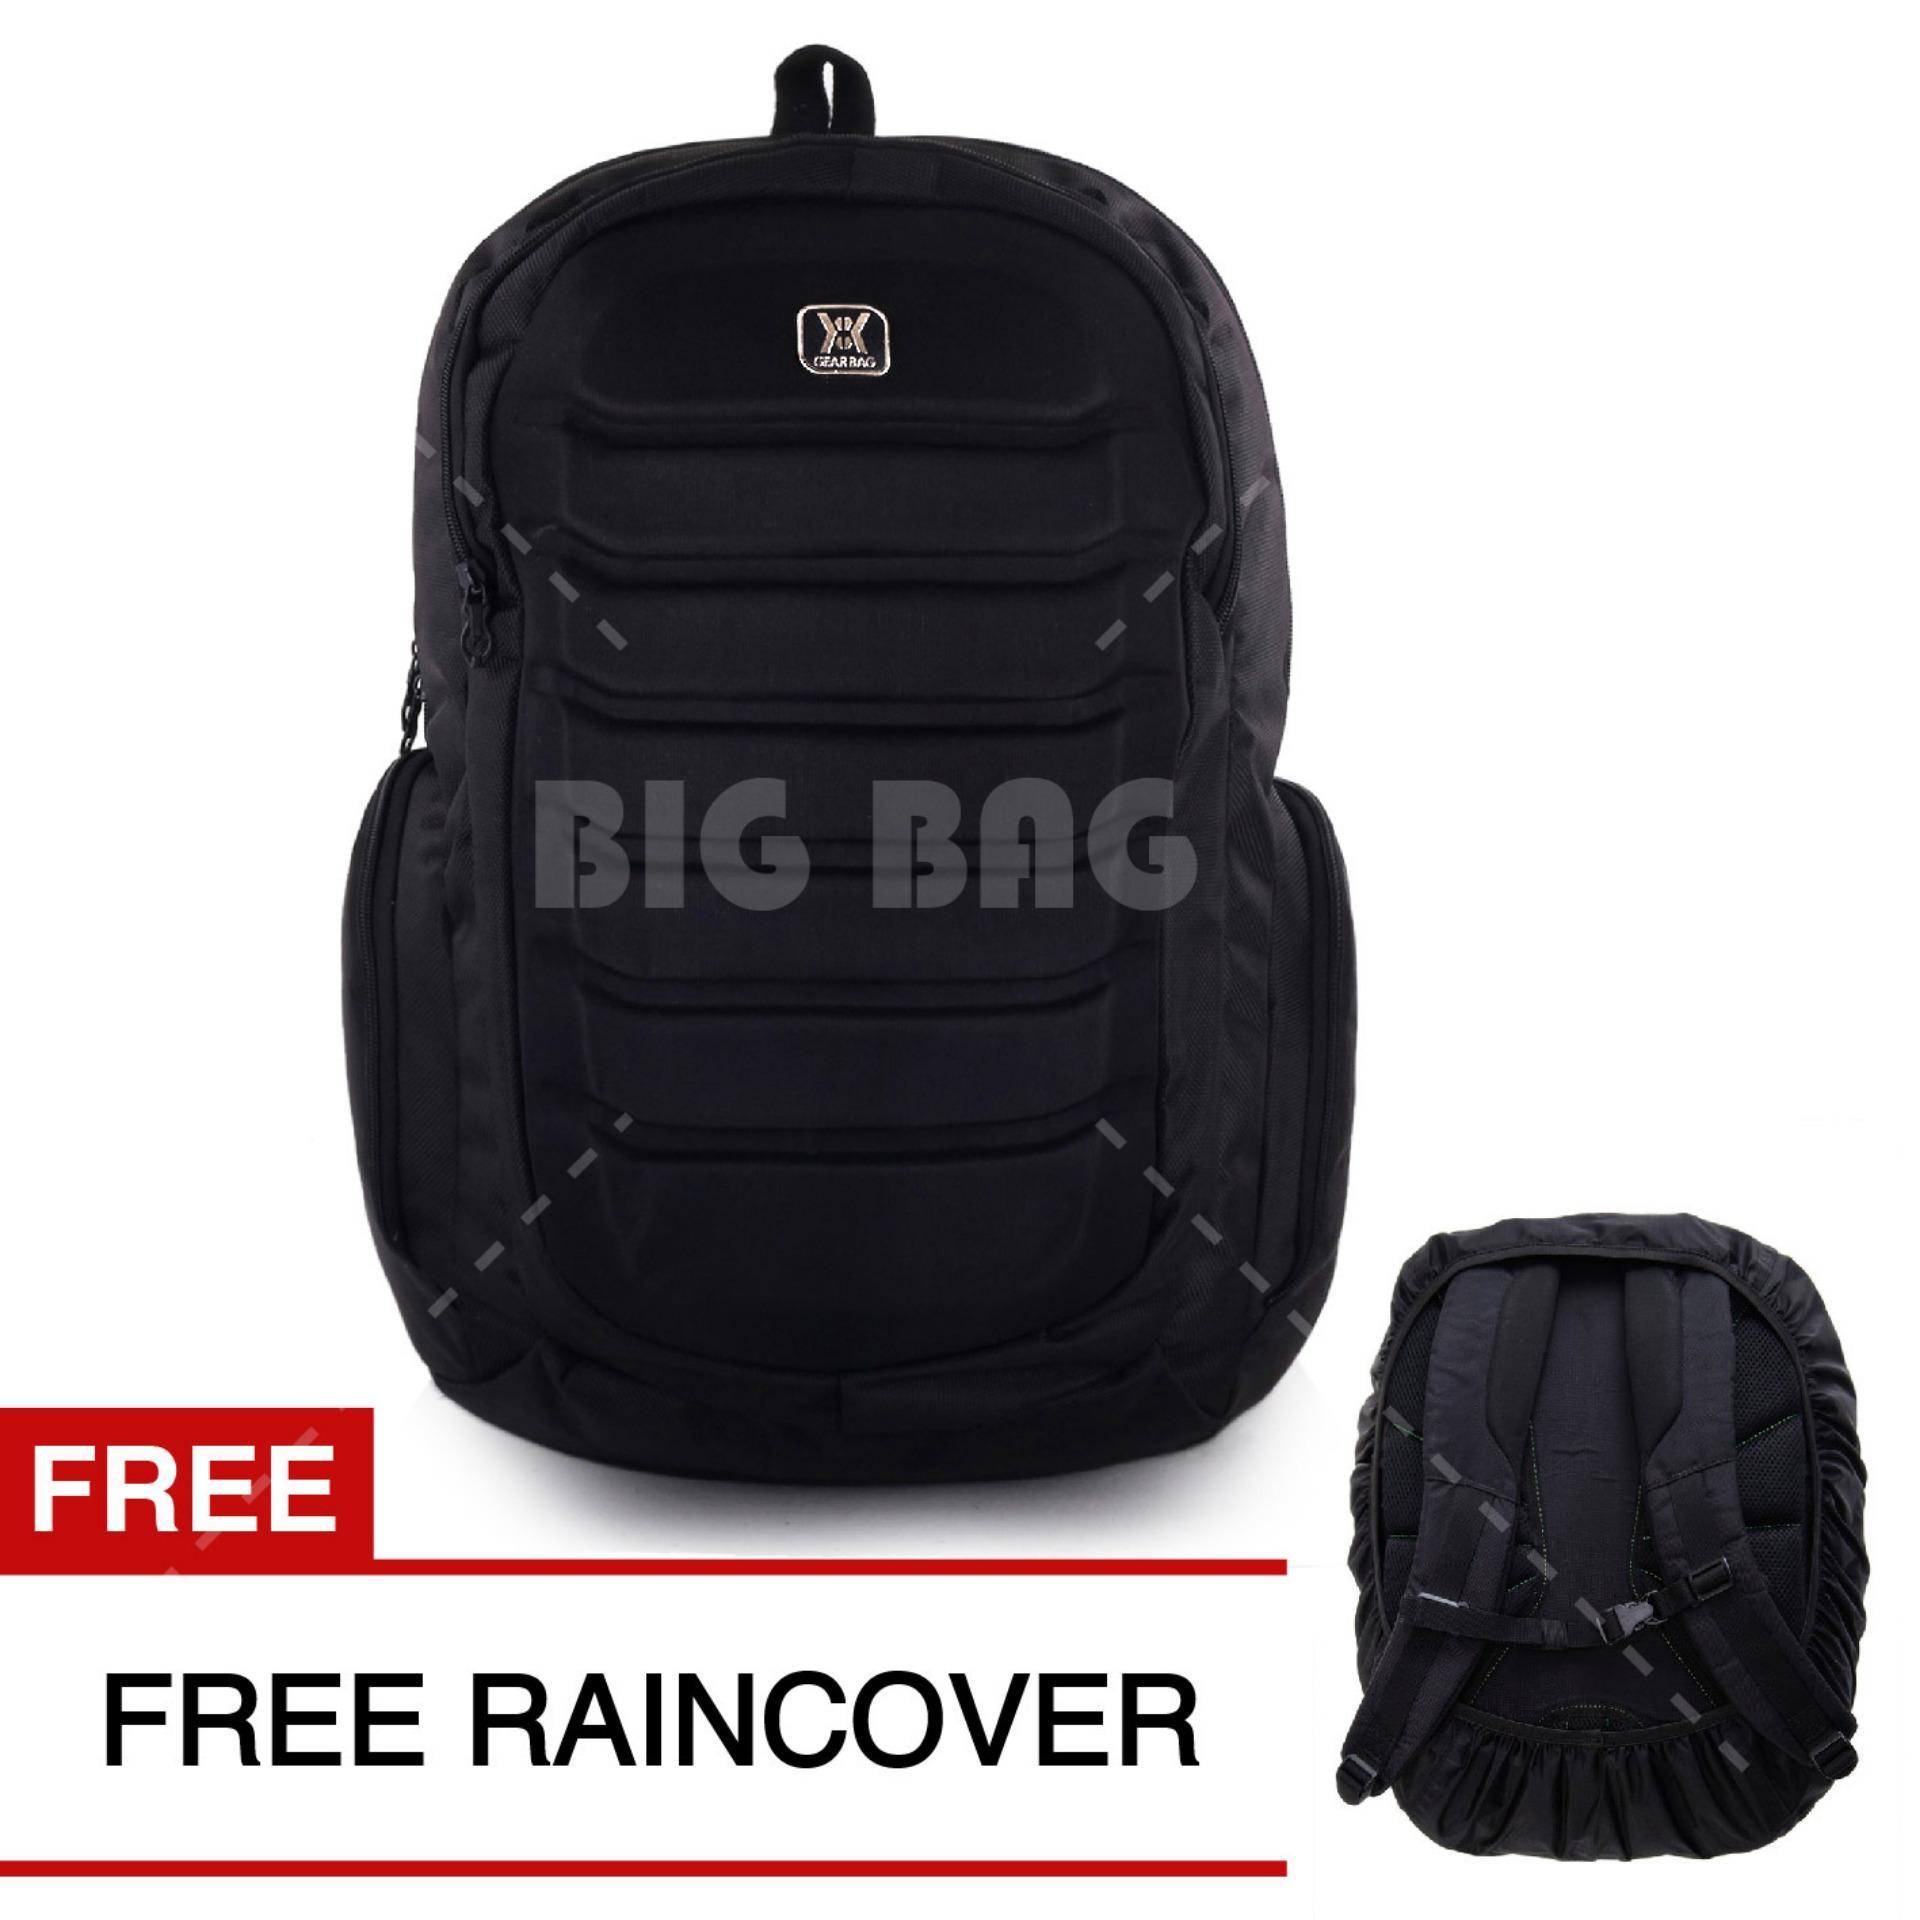 Harga Tas Ransel Gear Bag Predator Tas Laptop Backpack Black Free Raincover Tas Pria Tas Kerja Tas Sekolah Dailypack Tas Fashion Pria Online